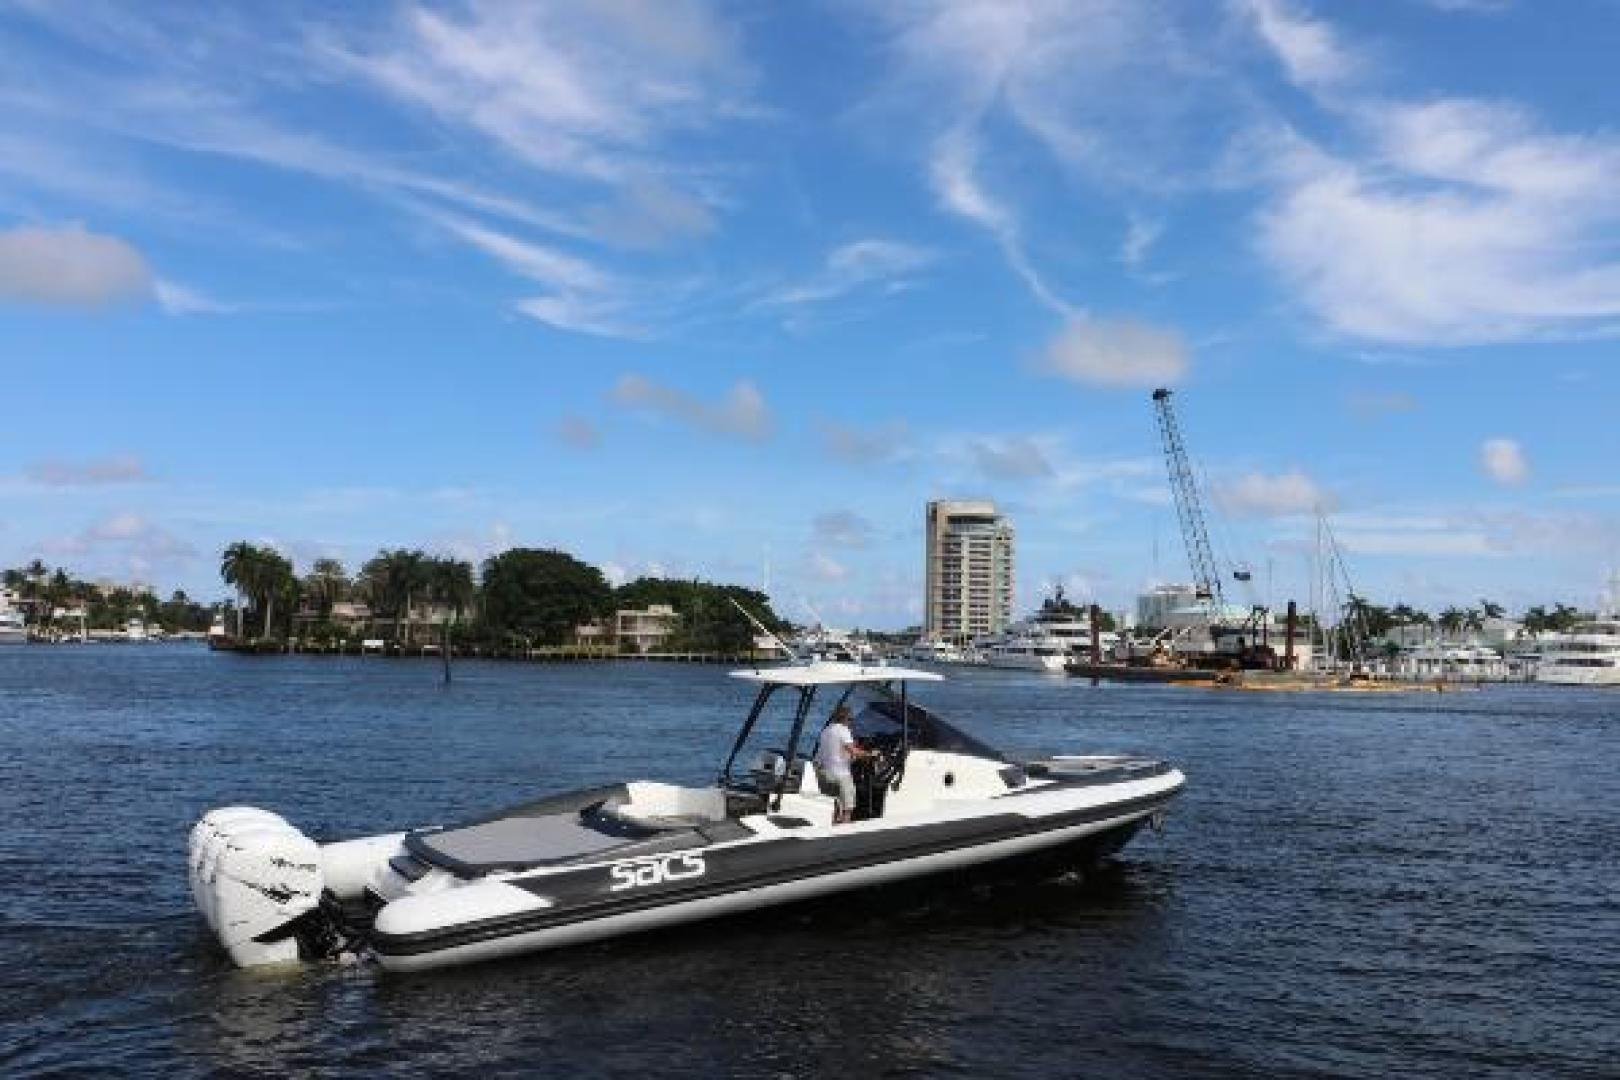 Sacs-Strider 40 ESSE R 2016-Sacs Strider 40 ESSE R Fort Lauderdale-Florida-United States-1533411   Thumbnail